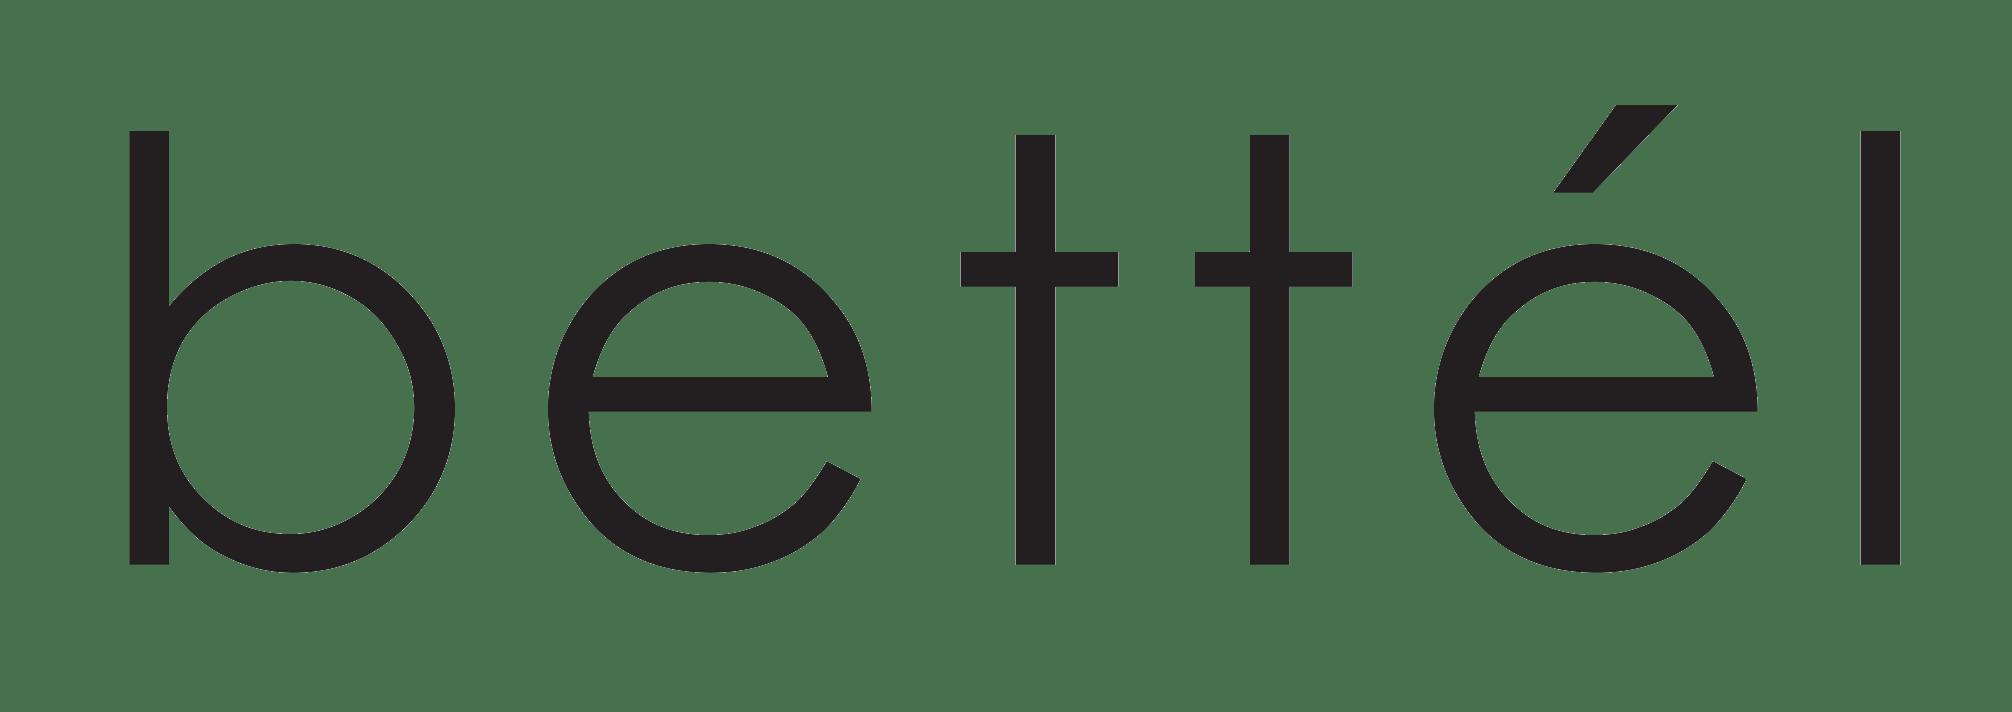 Bettél